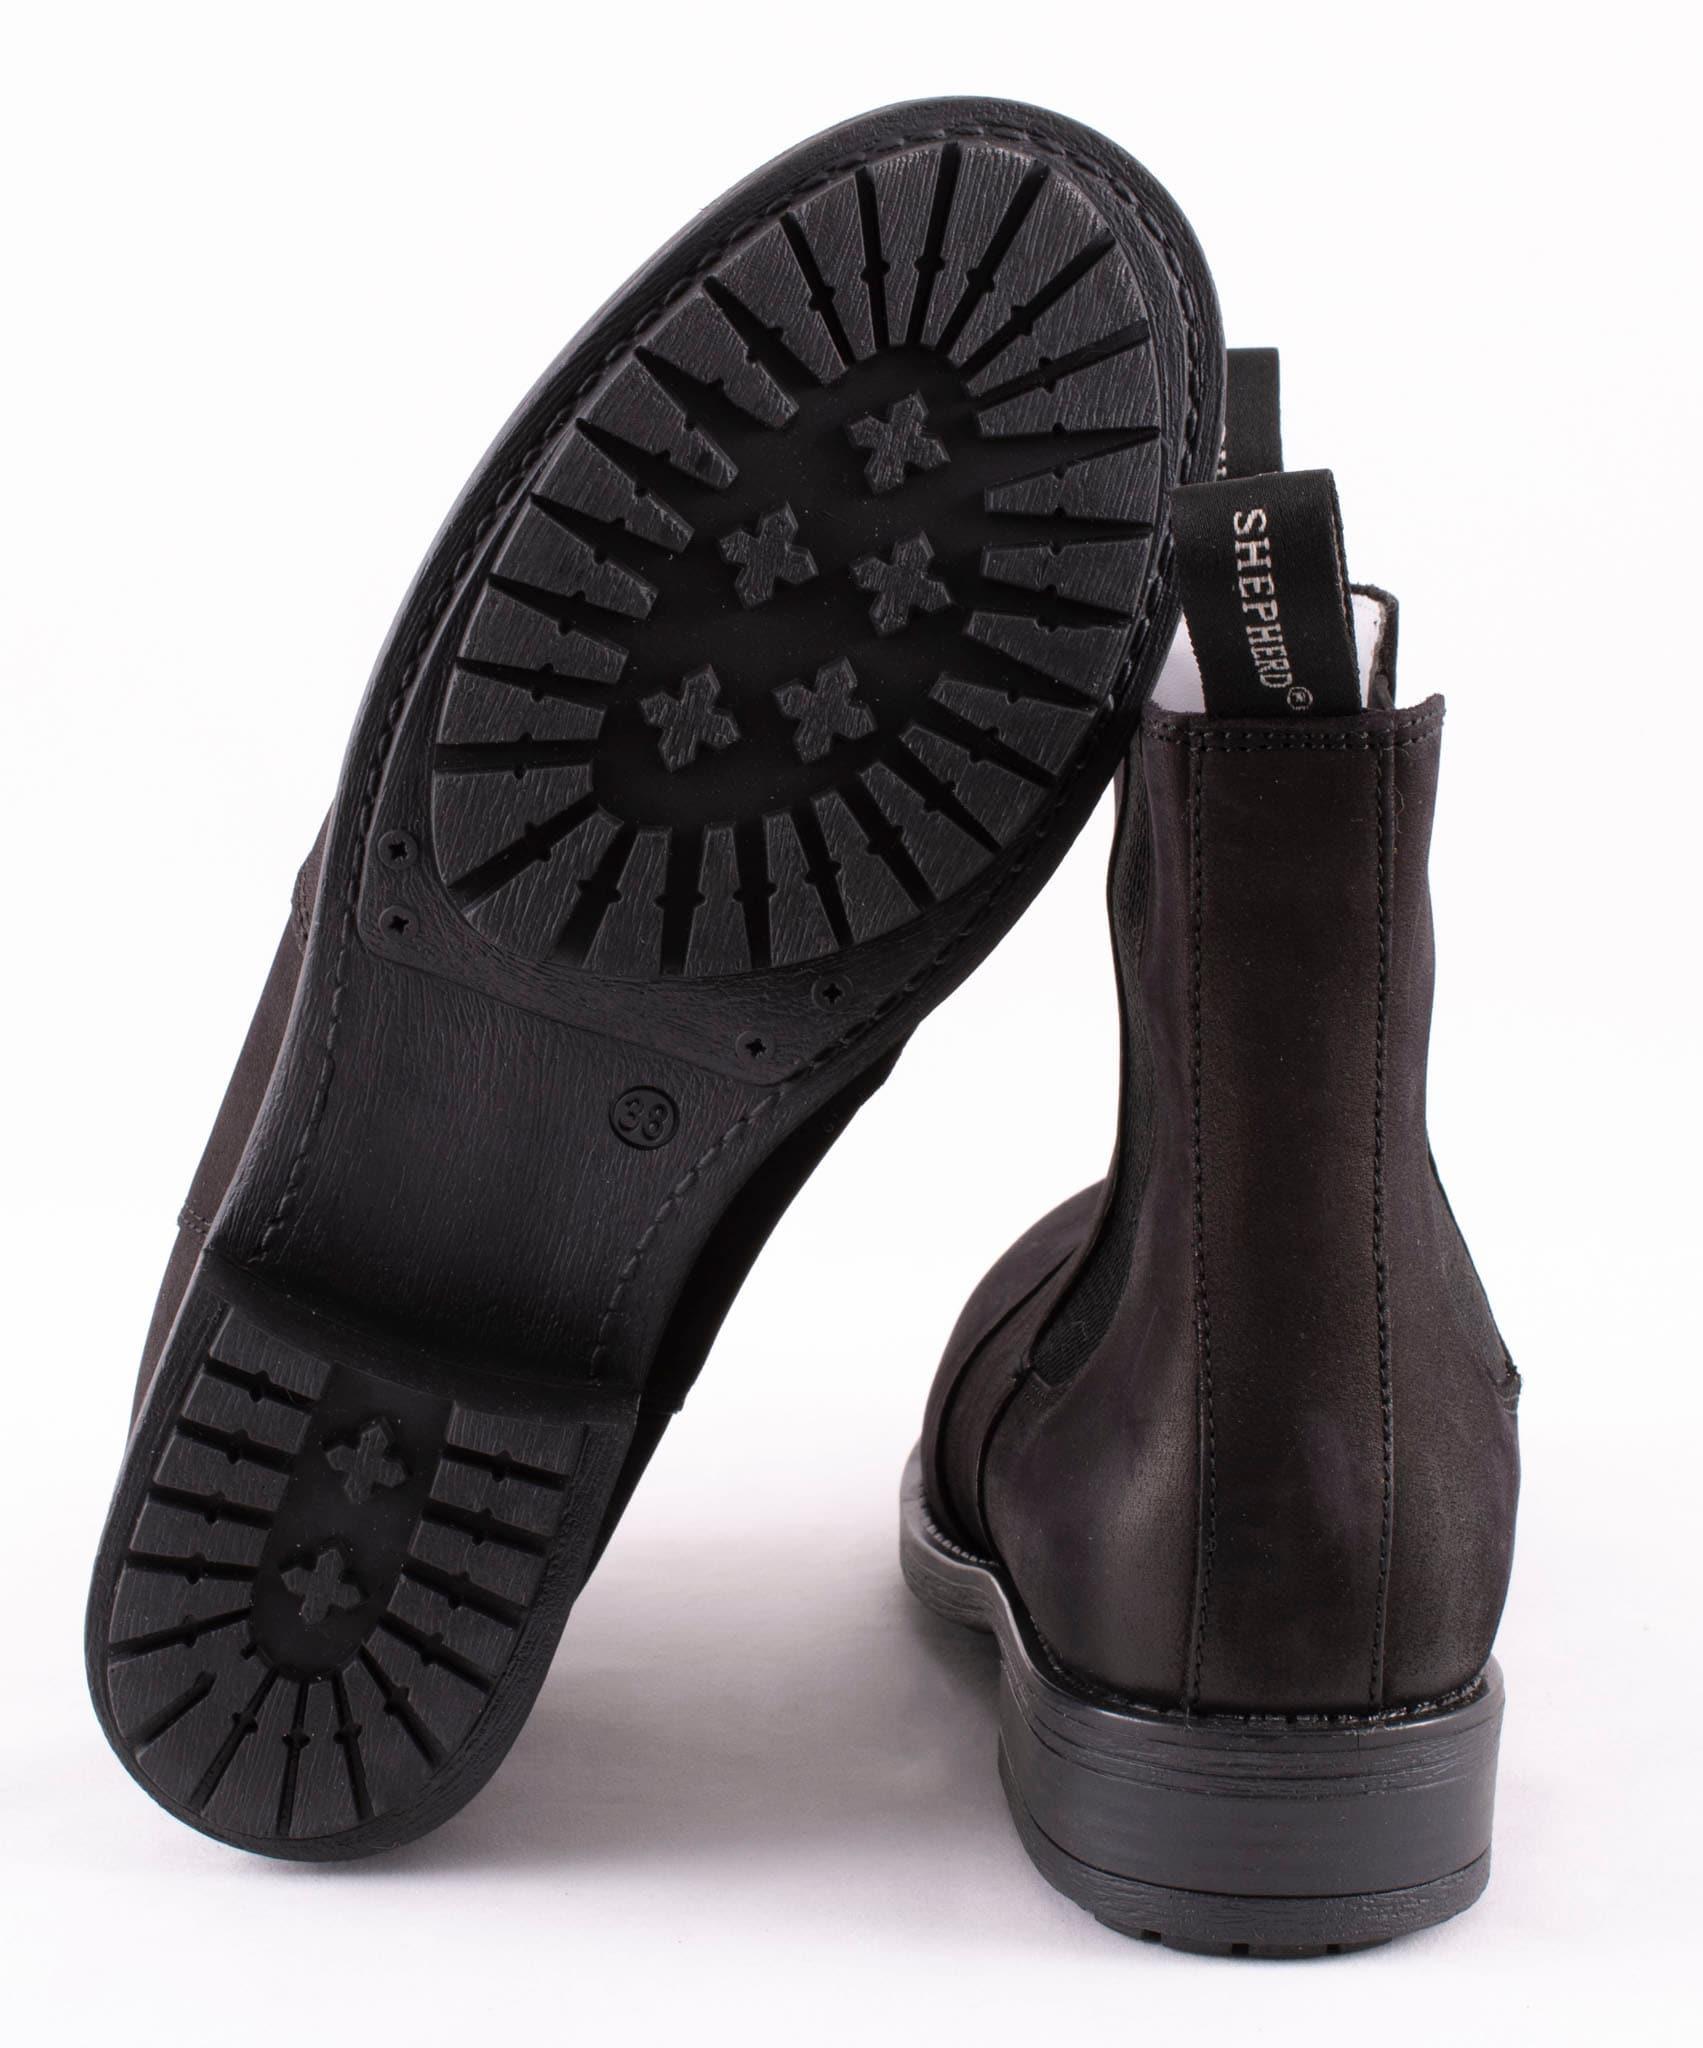 Sanna boots